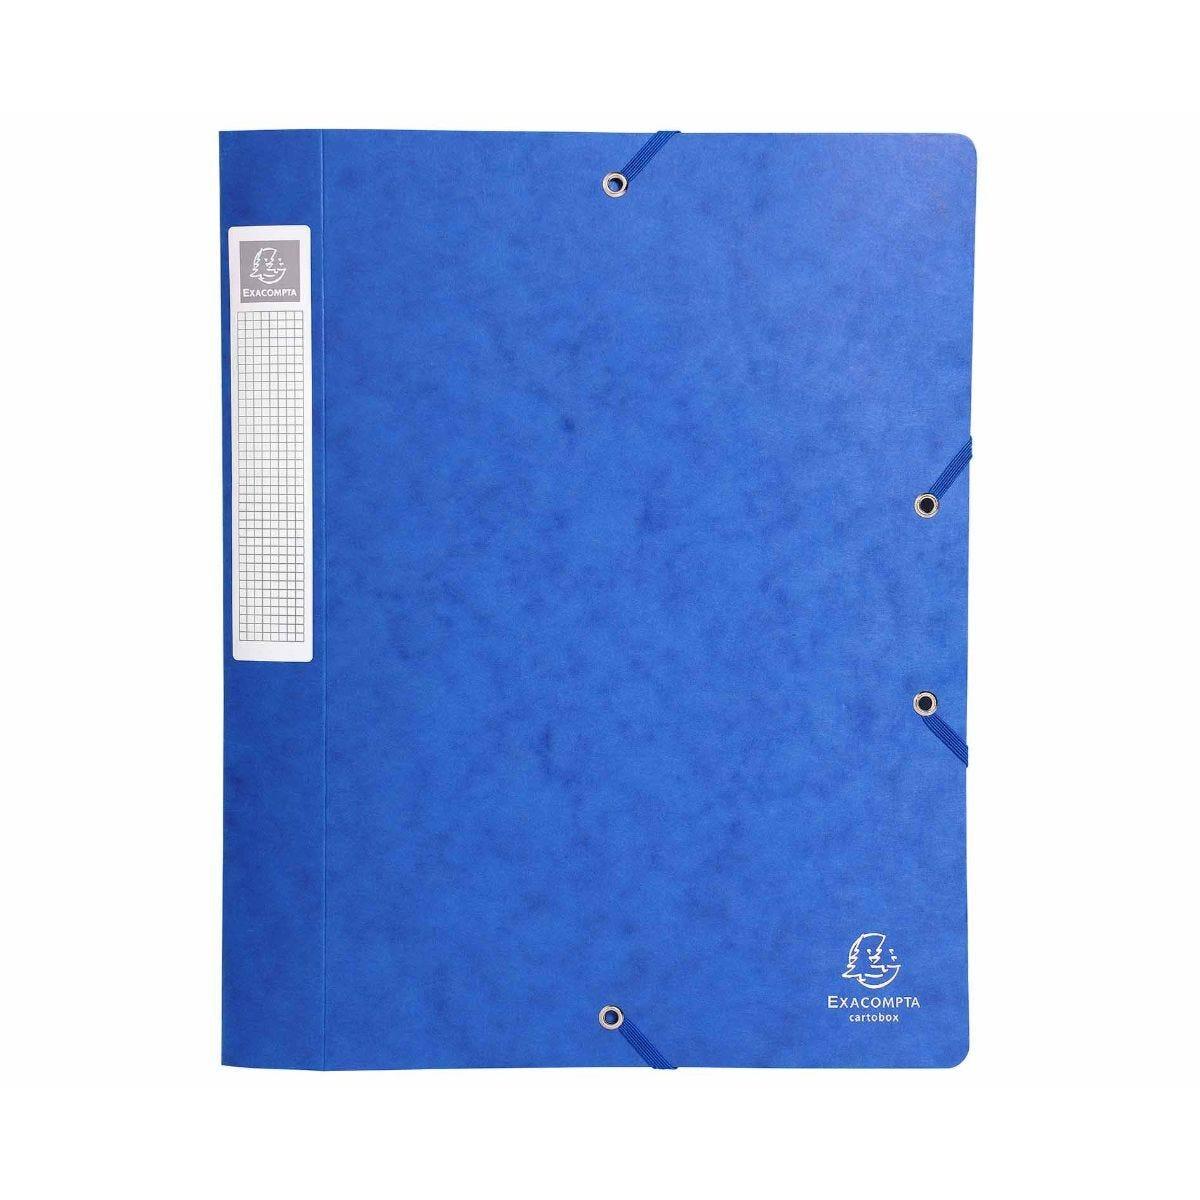 Exacompta Cartobox Box File A4 40mm Pack of 10 Blue